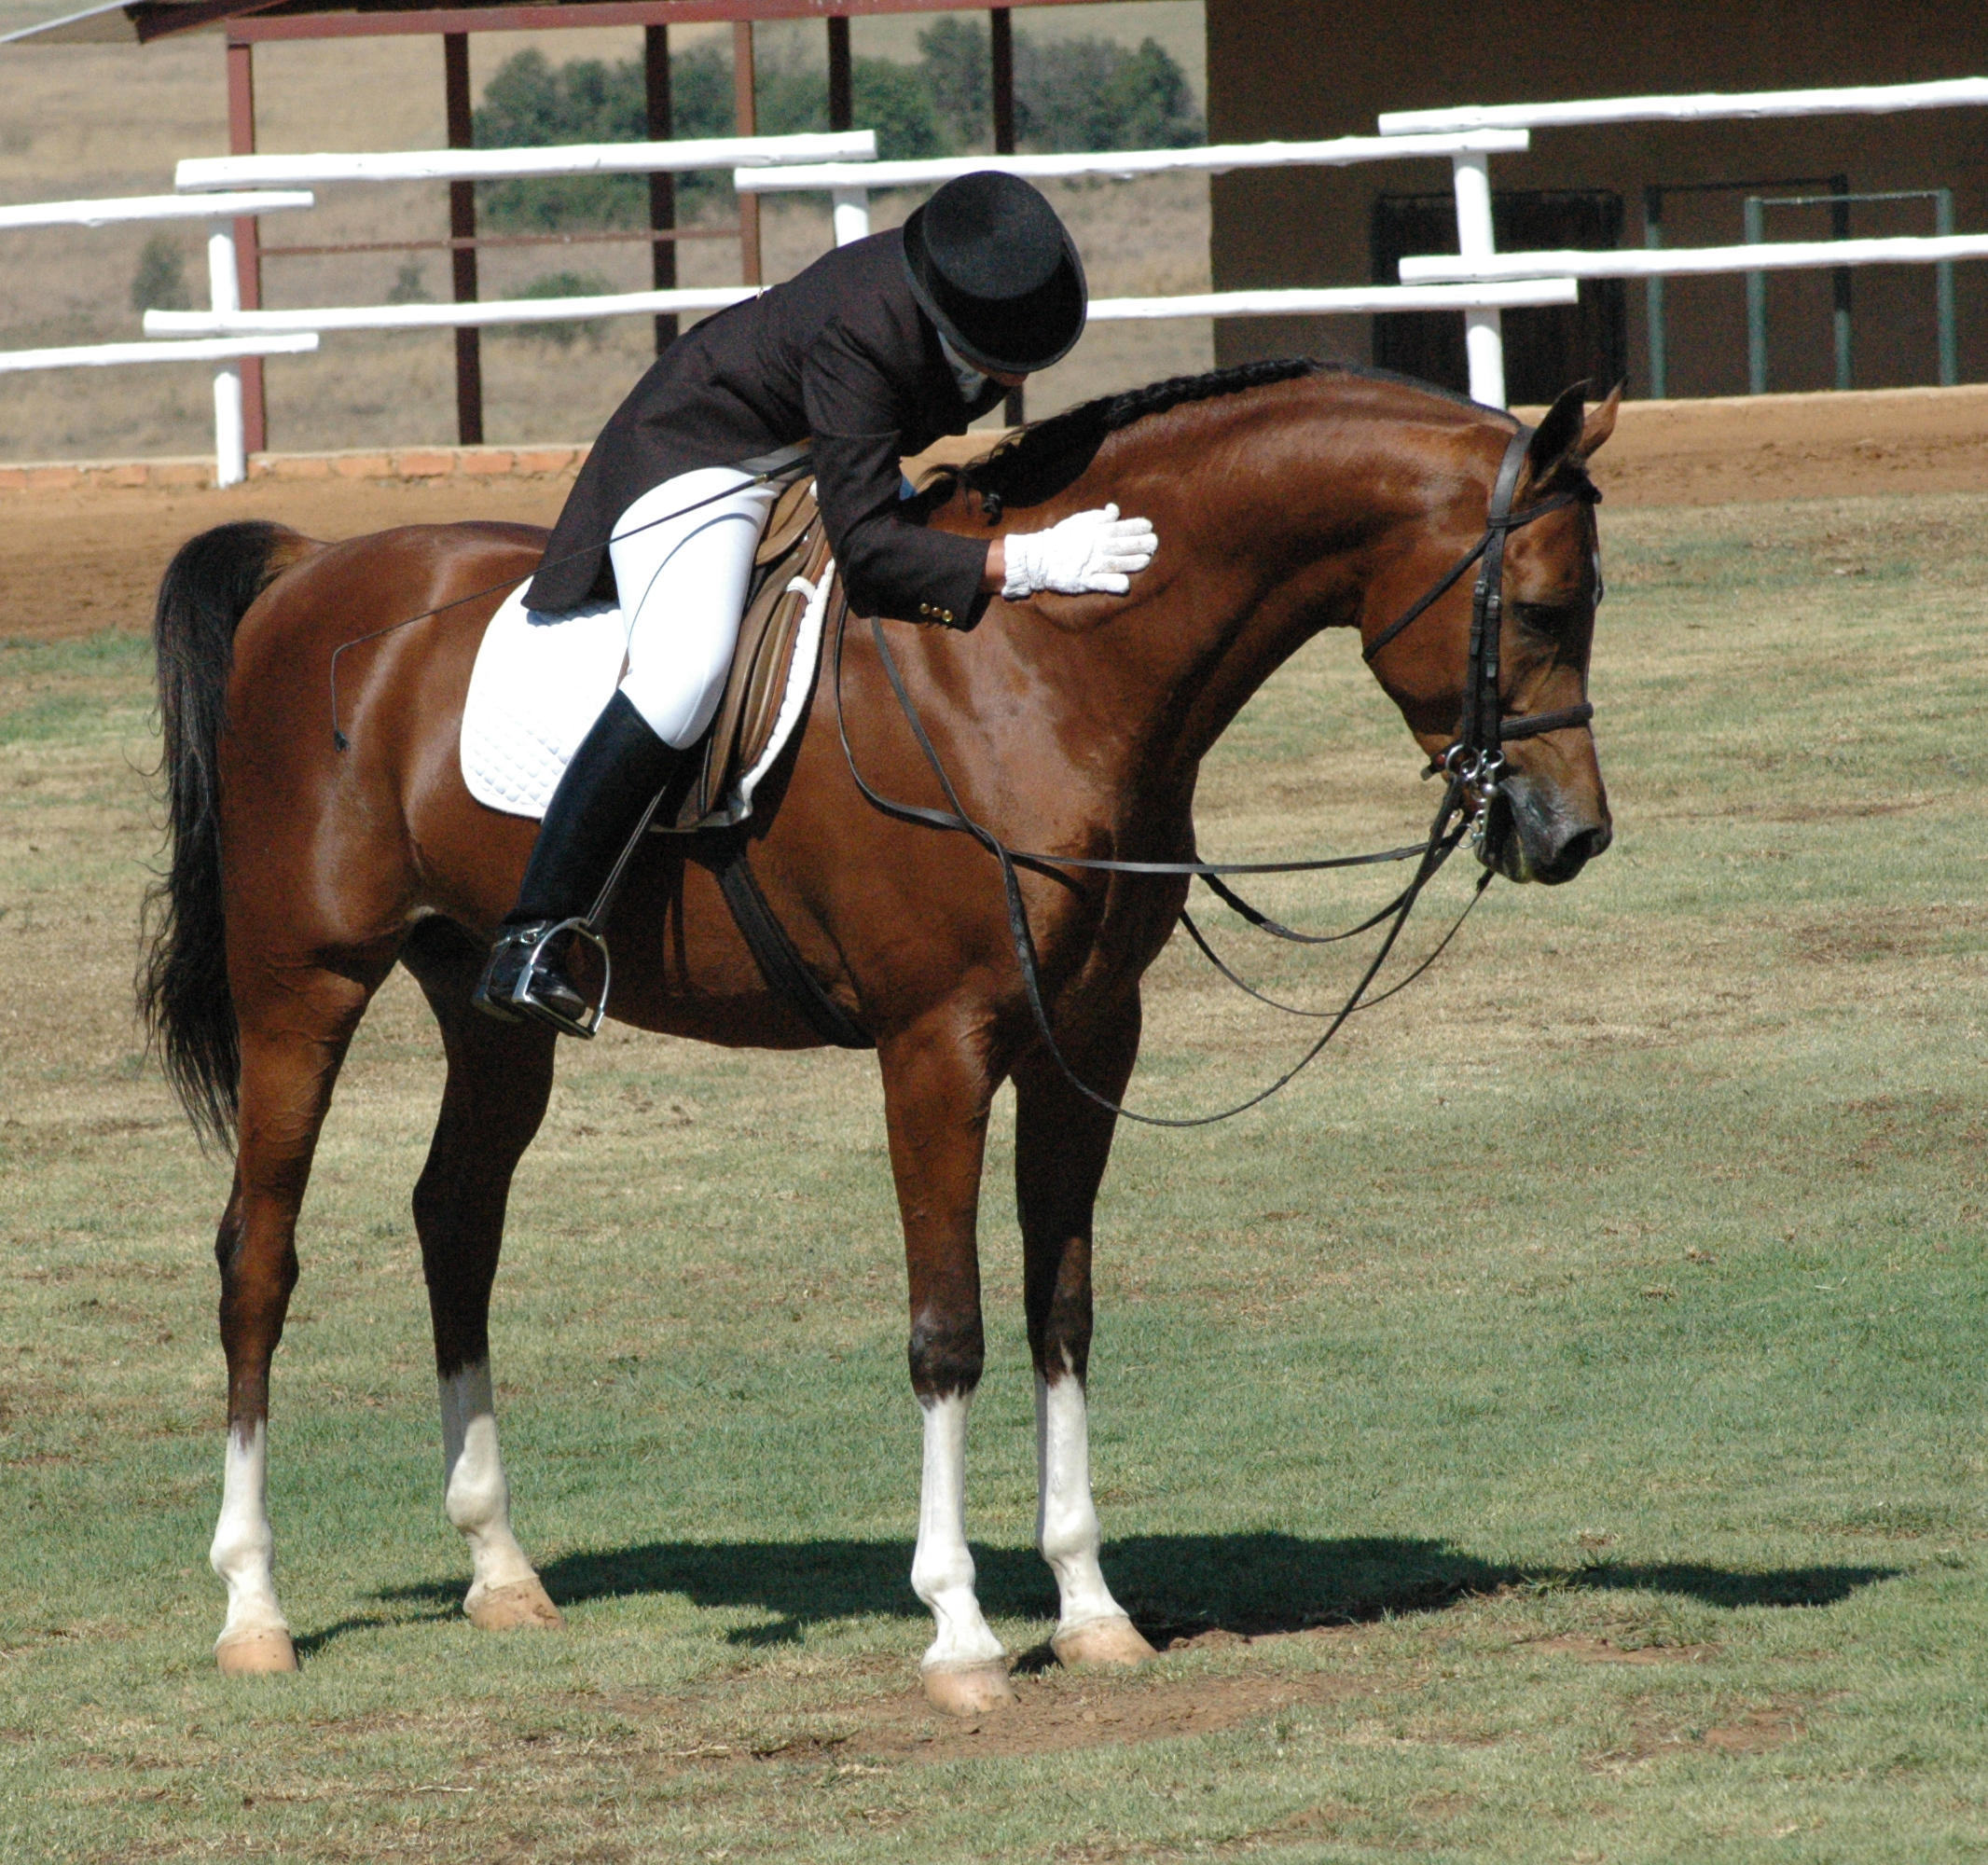 Riding horse - Wikipedia